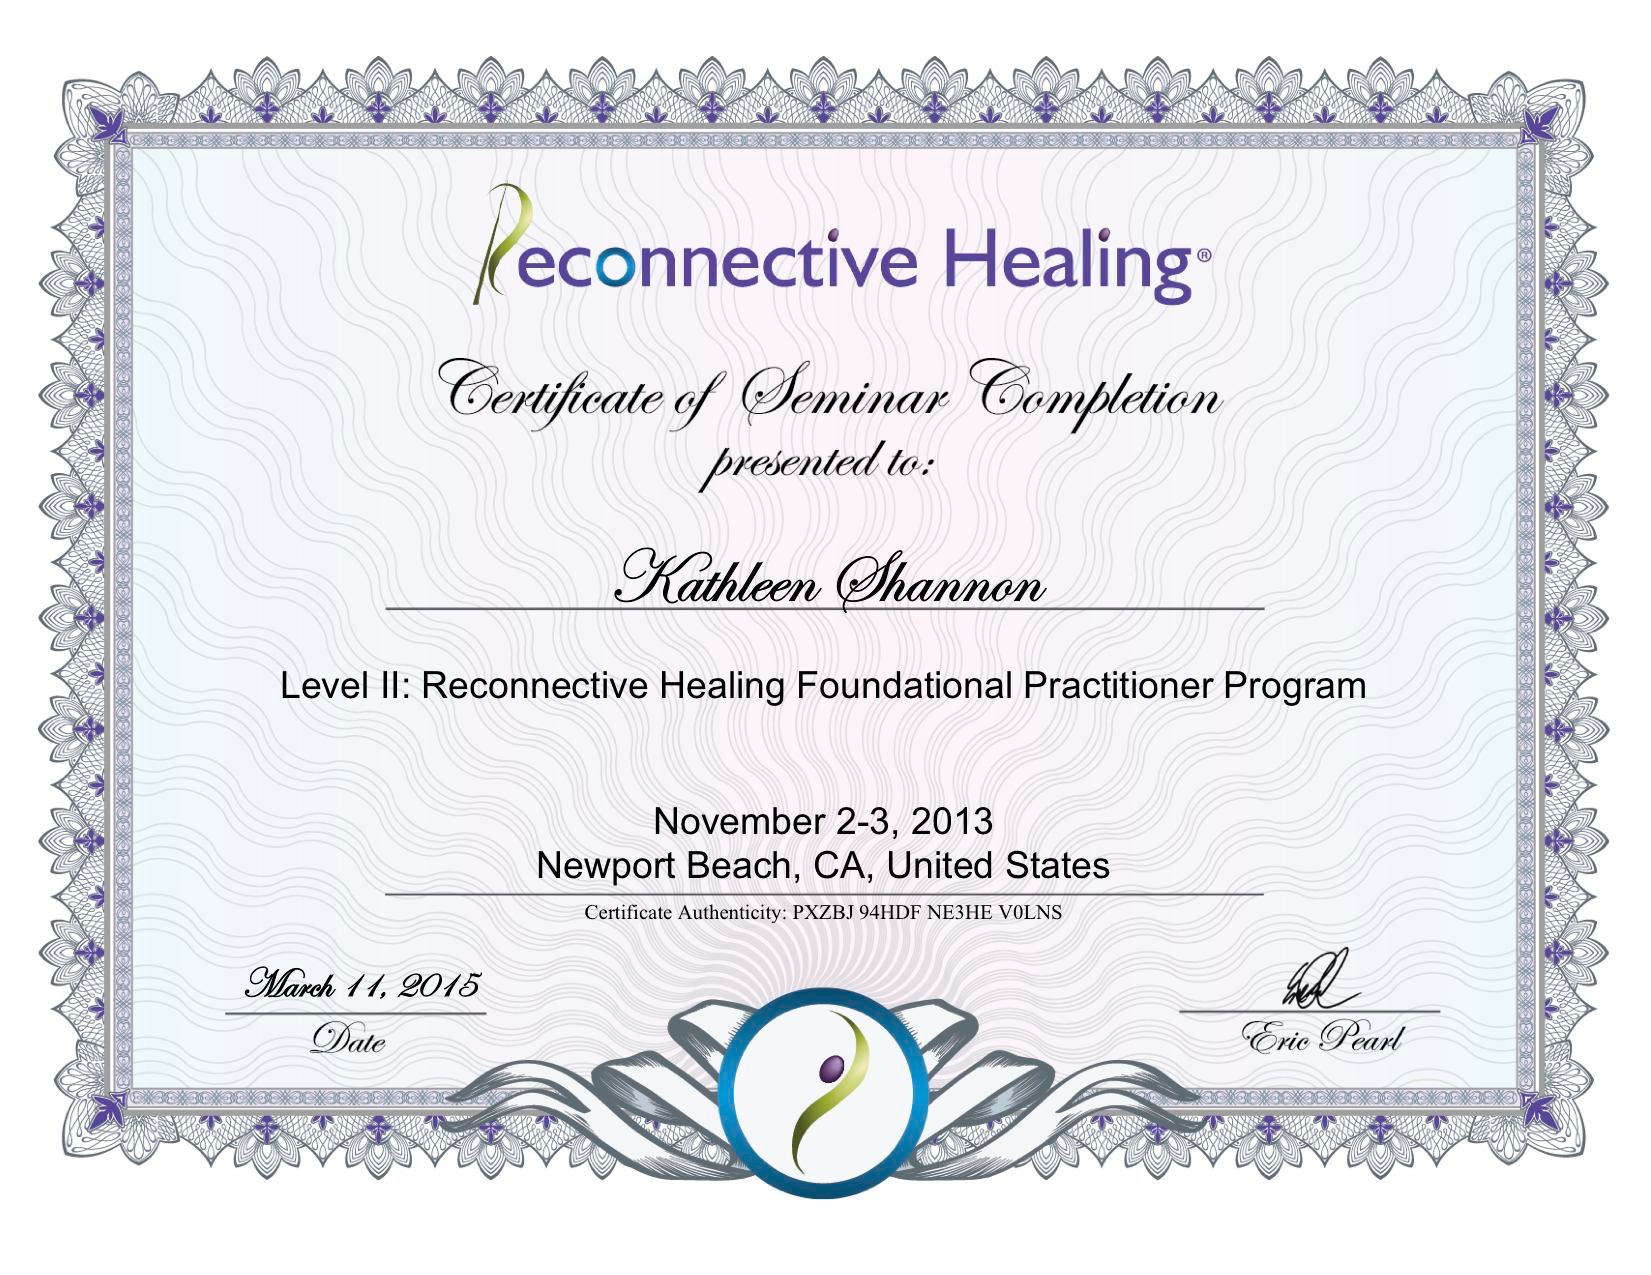 Reconnective Healing Certificate